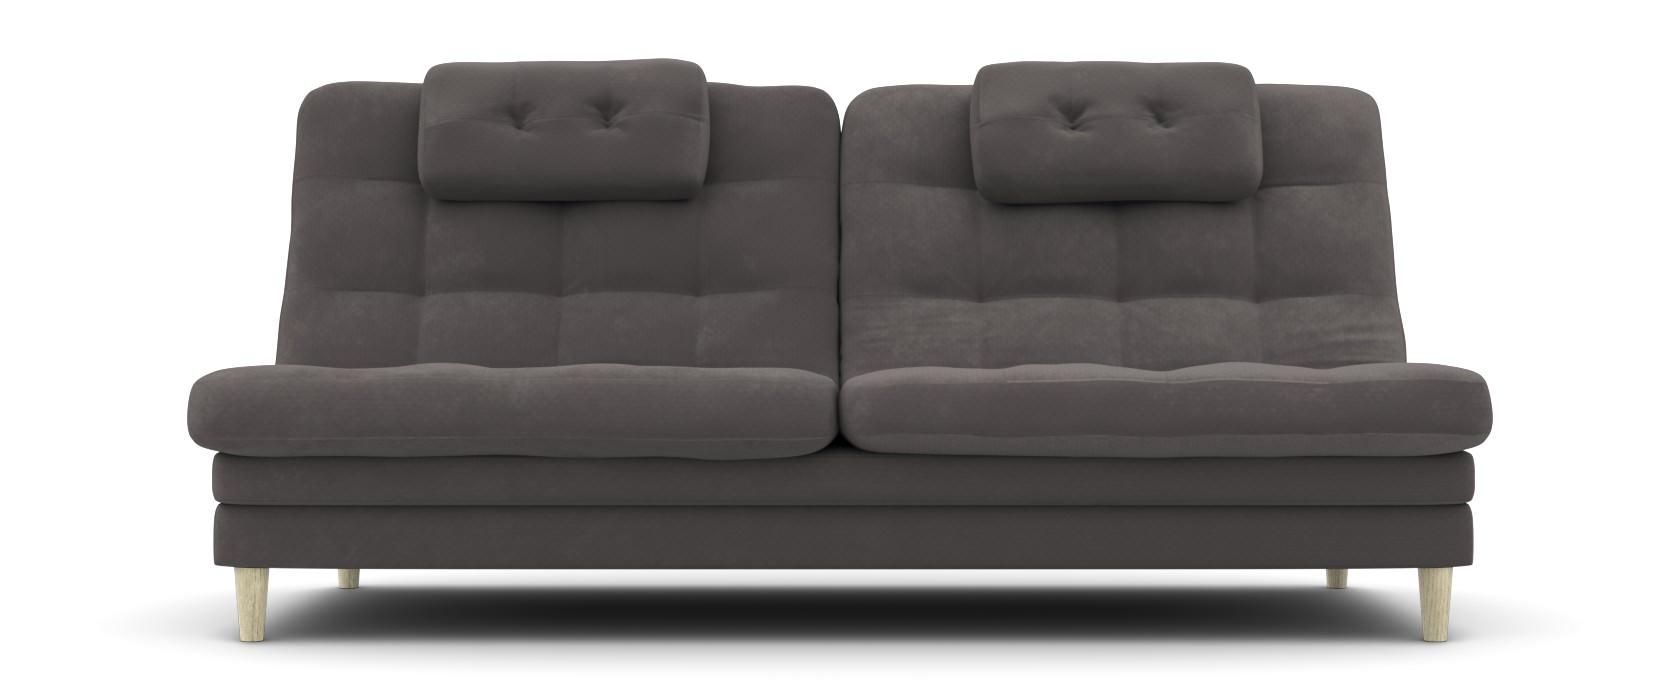 Трехместный диван Dino